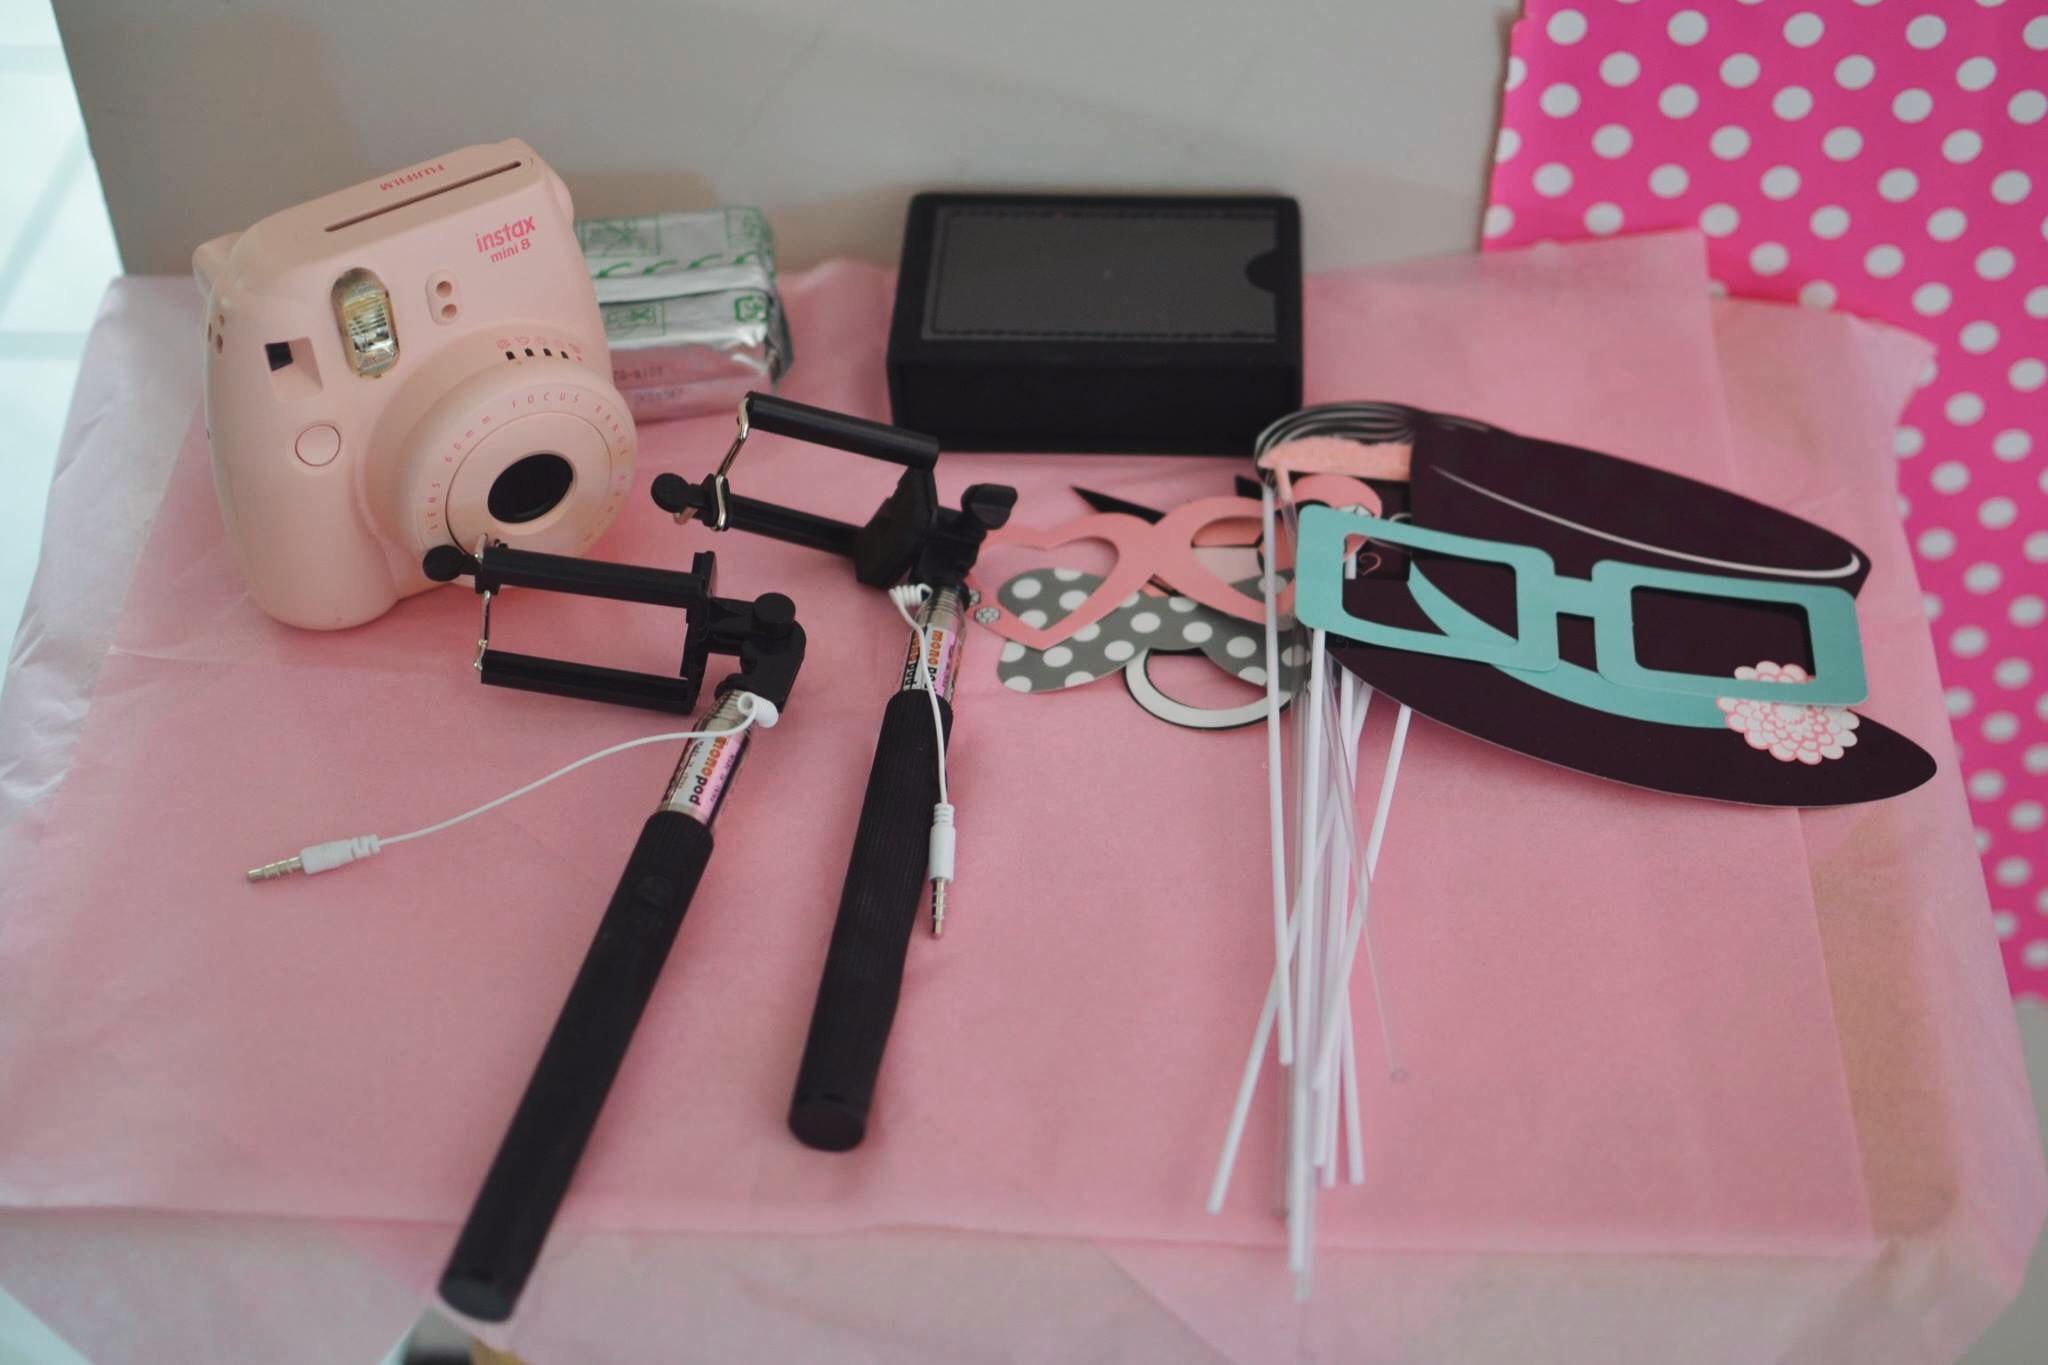 Polaroid camera, selfie sticks, and props